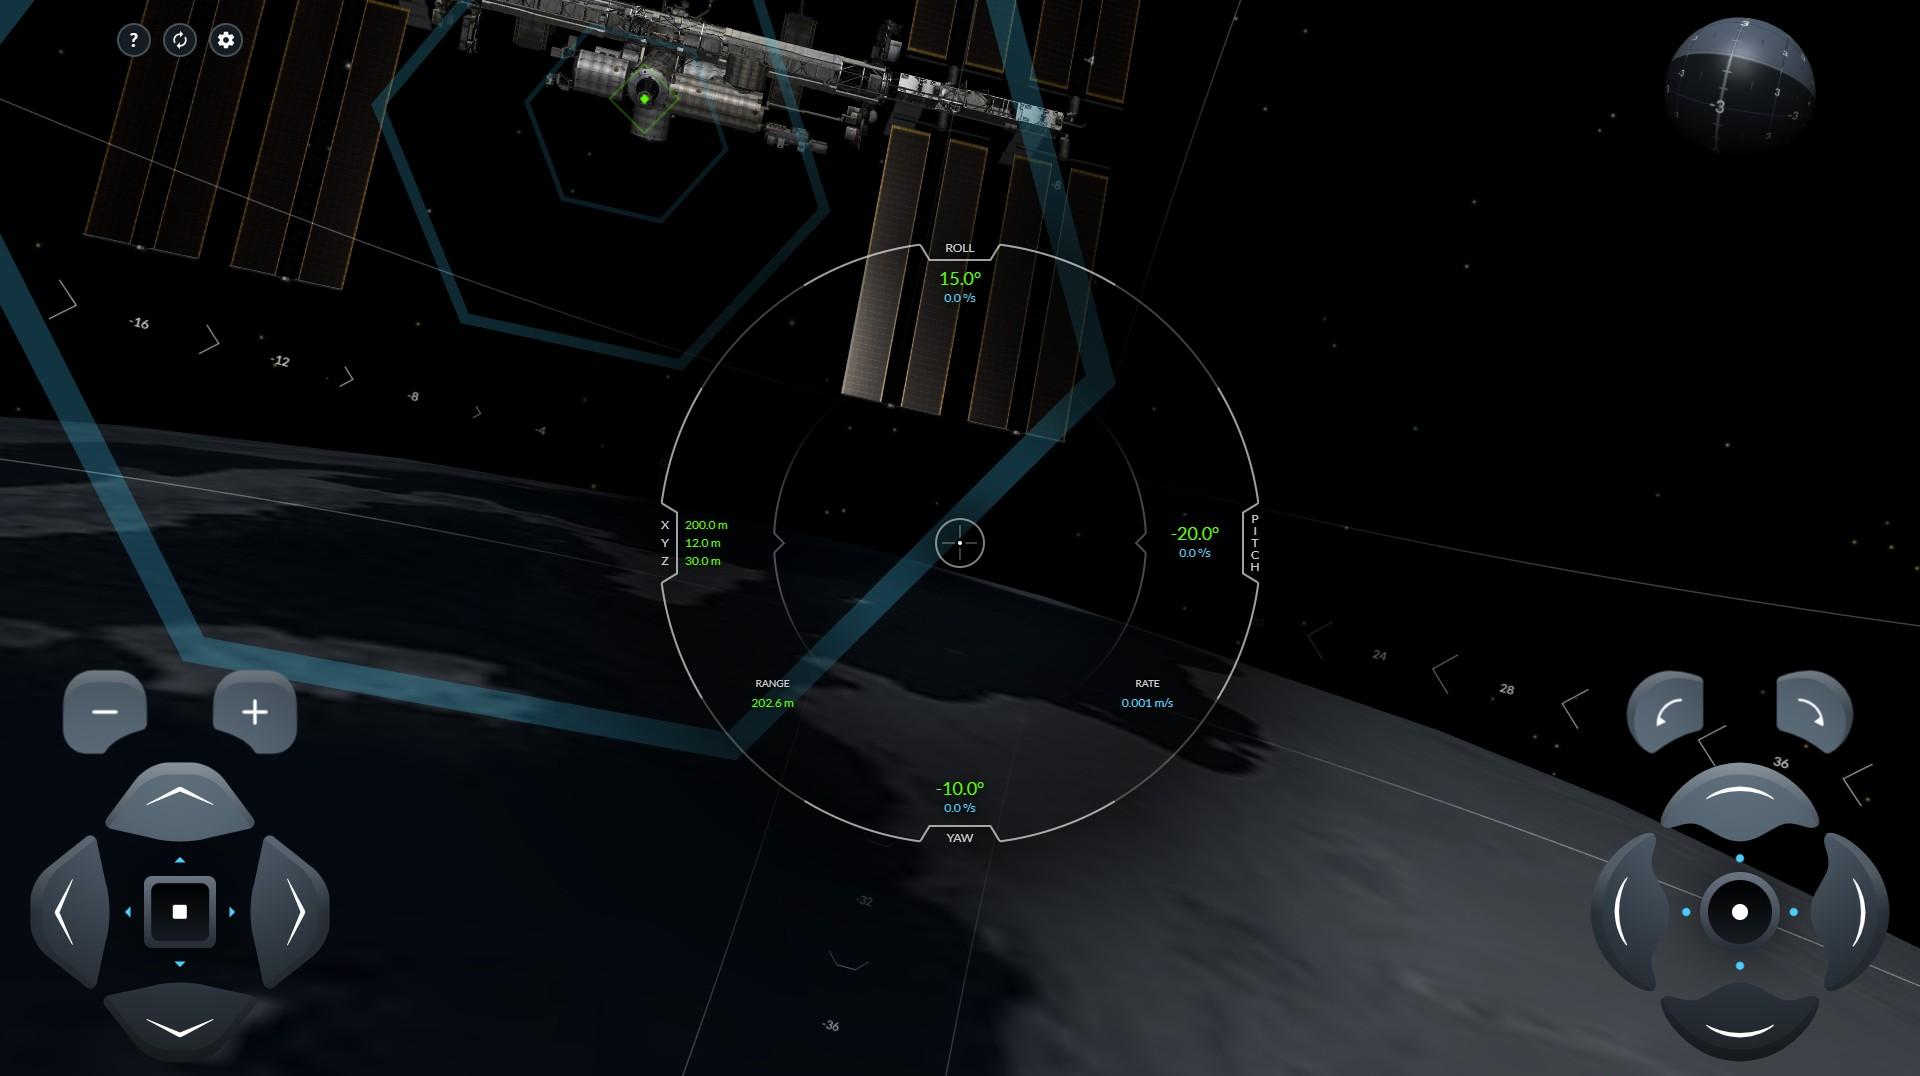 SpaceX crew dragon simulator